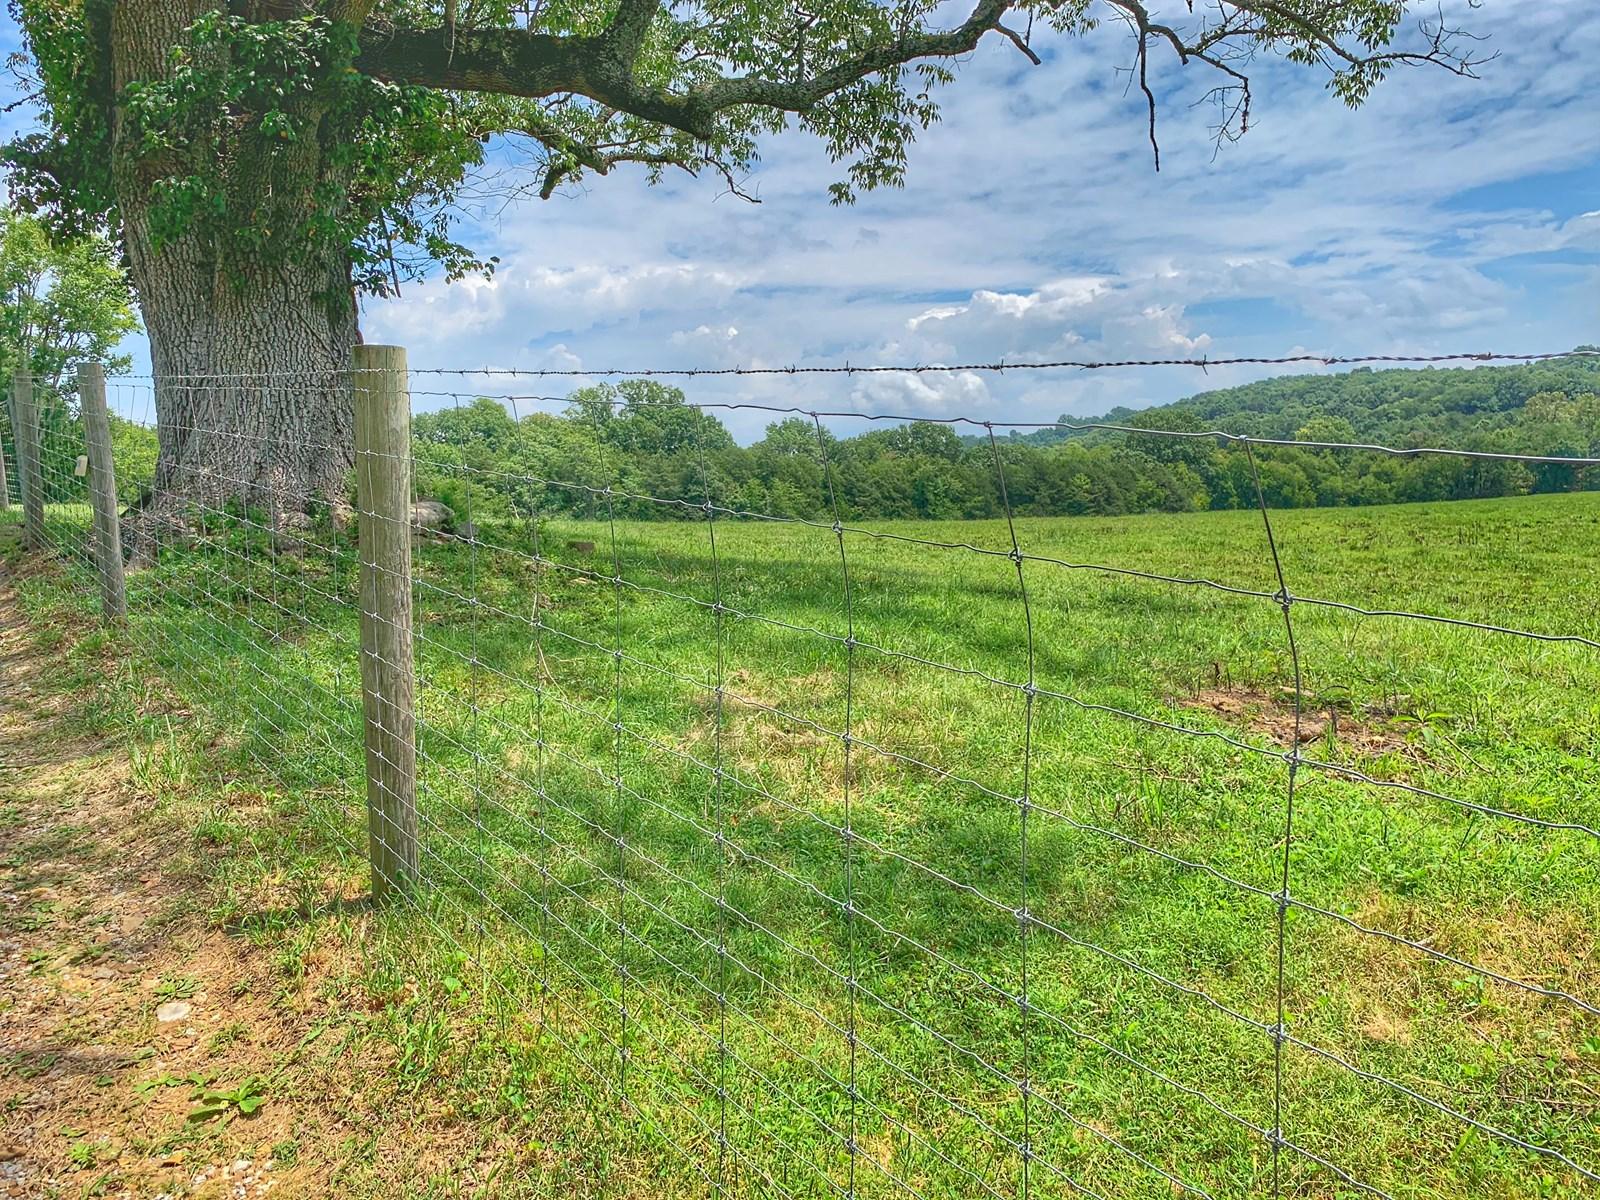 fences and cross fences